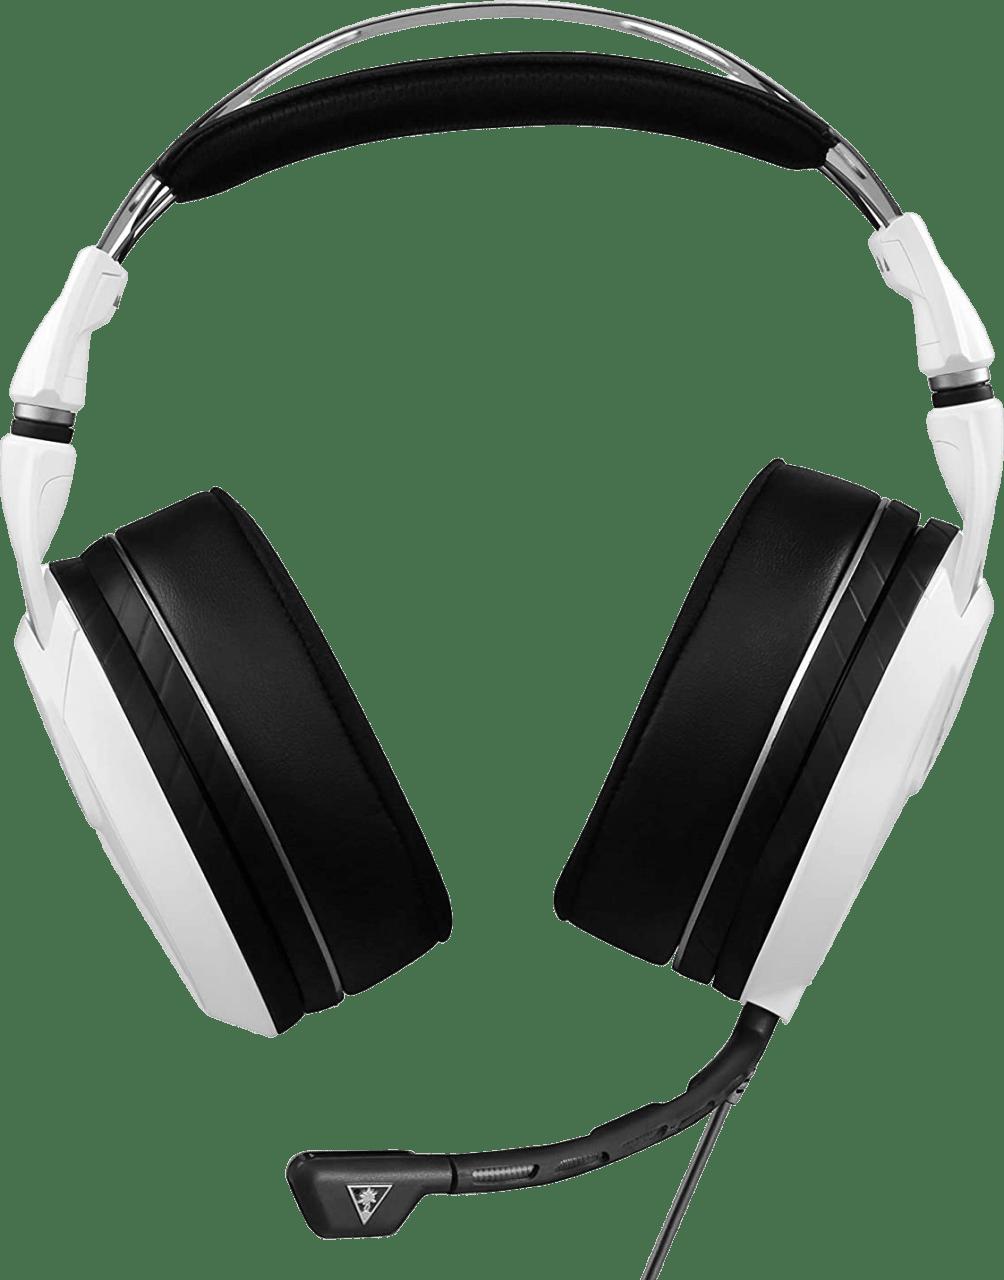 White / Black Turtle Beach Elite Pro 2 + SuperAmp (Xbox) Over-ear Gaming Headphones.2